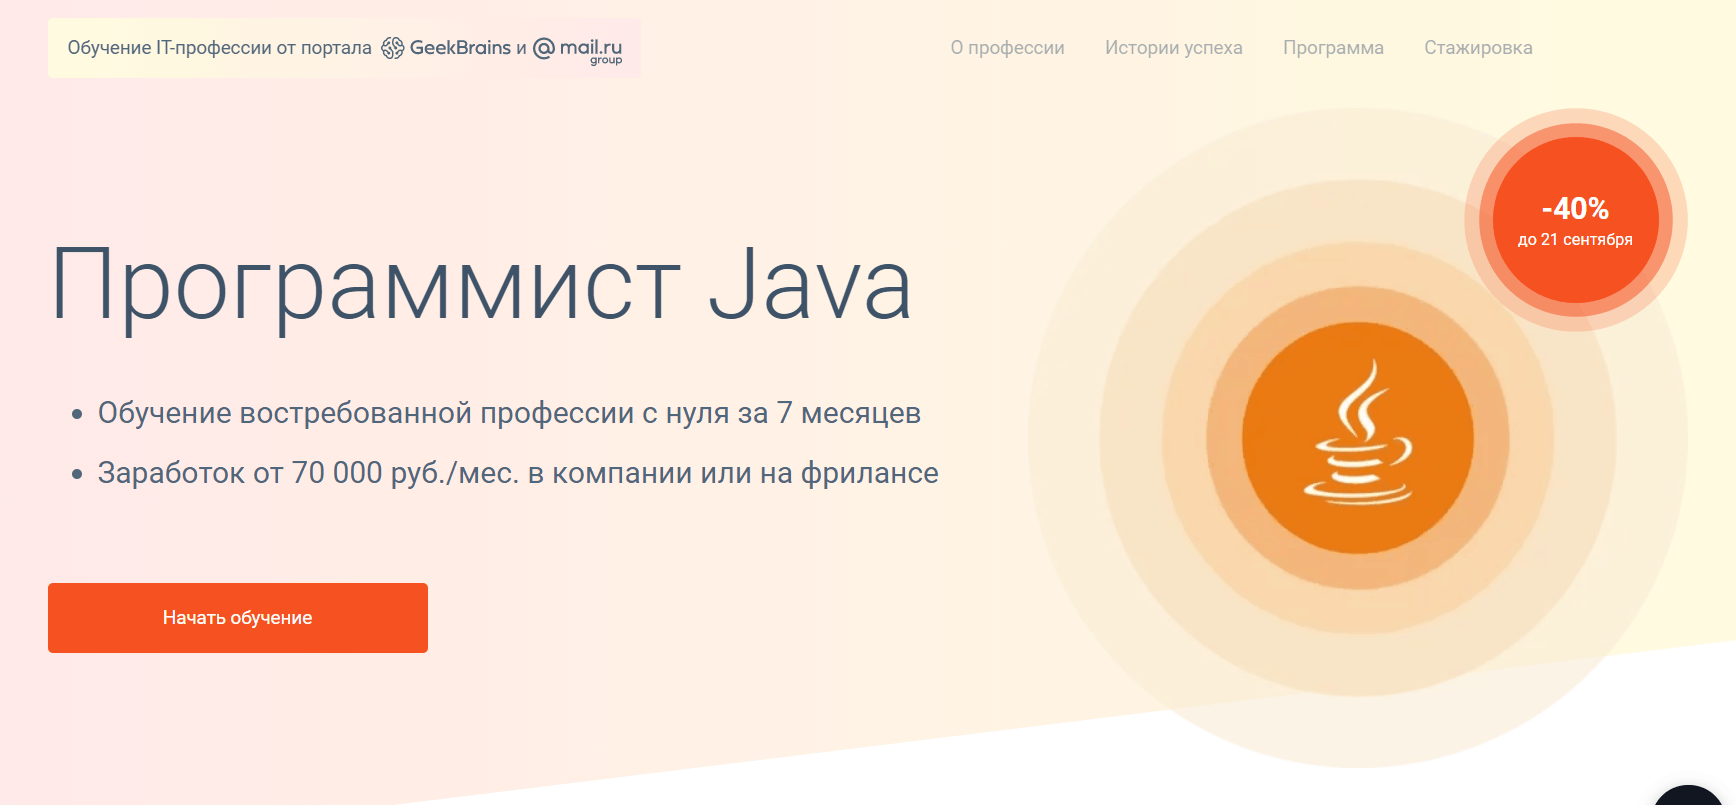 Программист Java